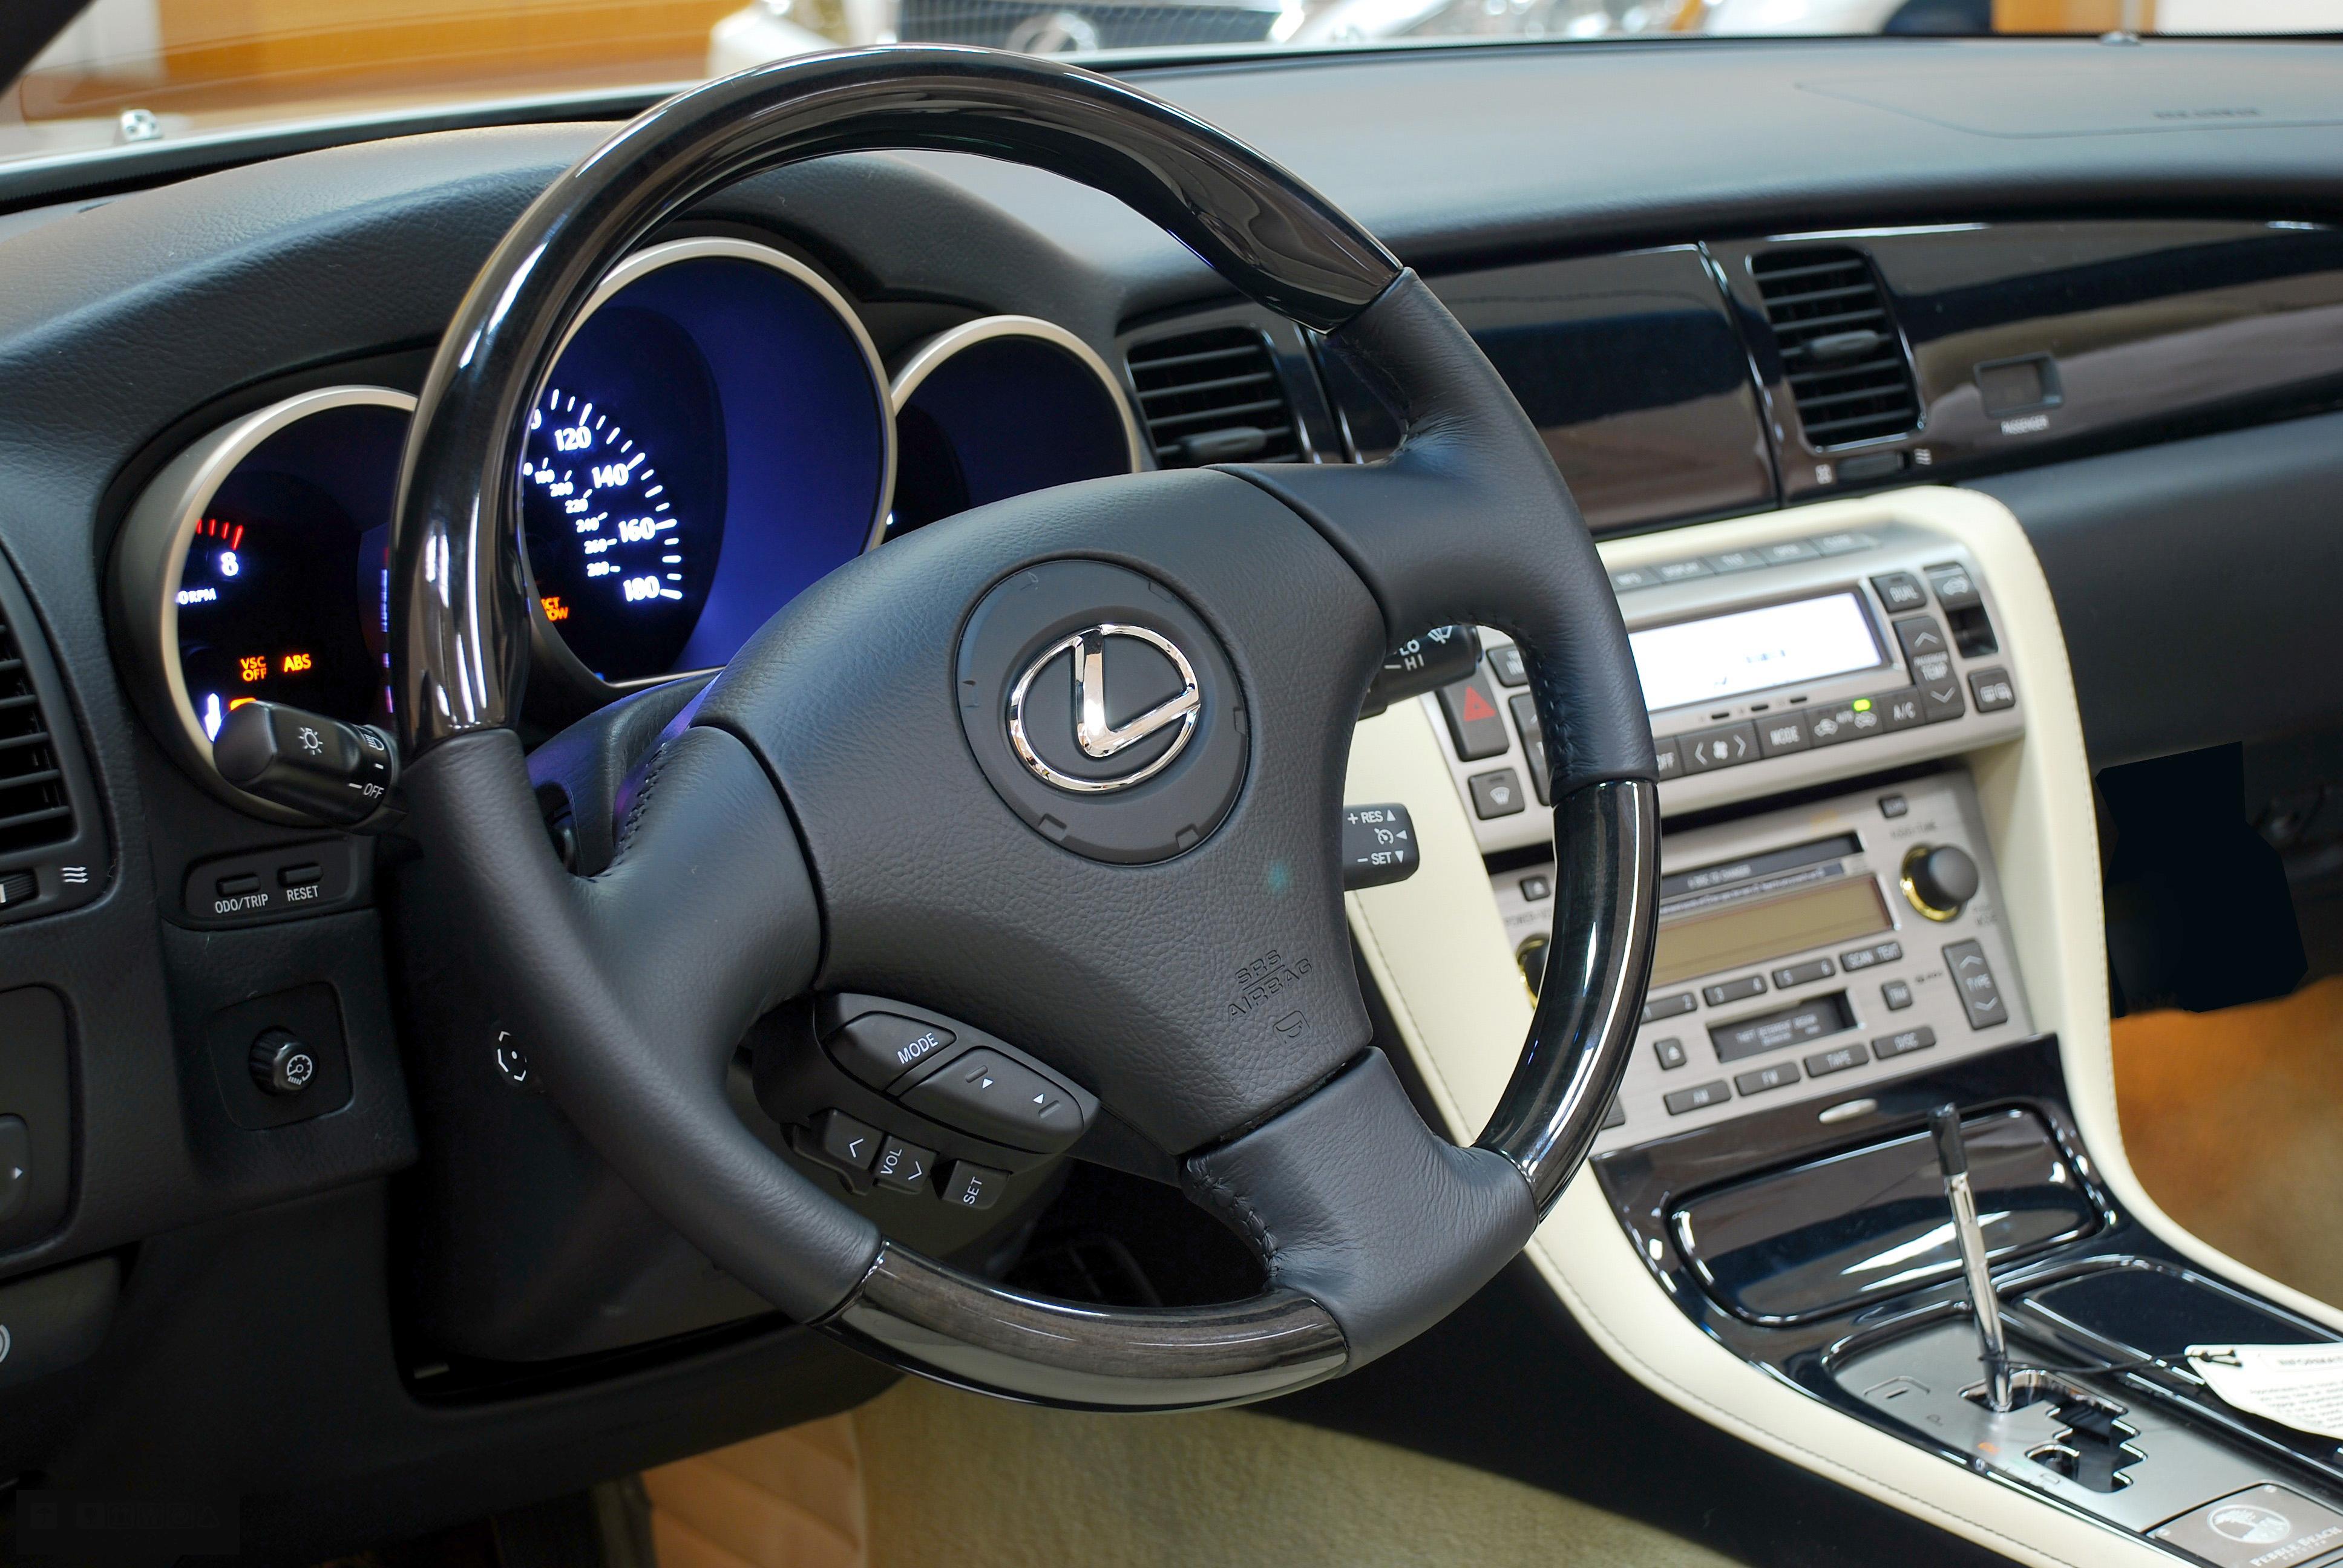 https://upload.wikimedia.org/wikipedia/commons/7/7d/Lexus-SC_430_forward_interior.jpg